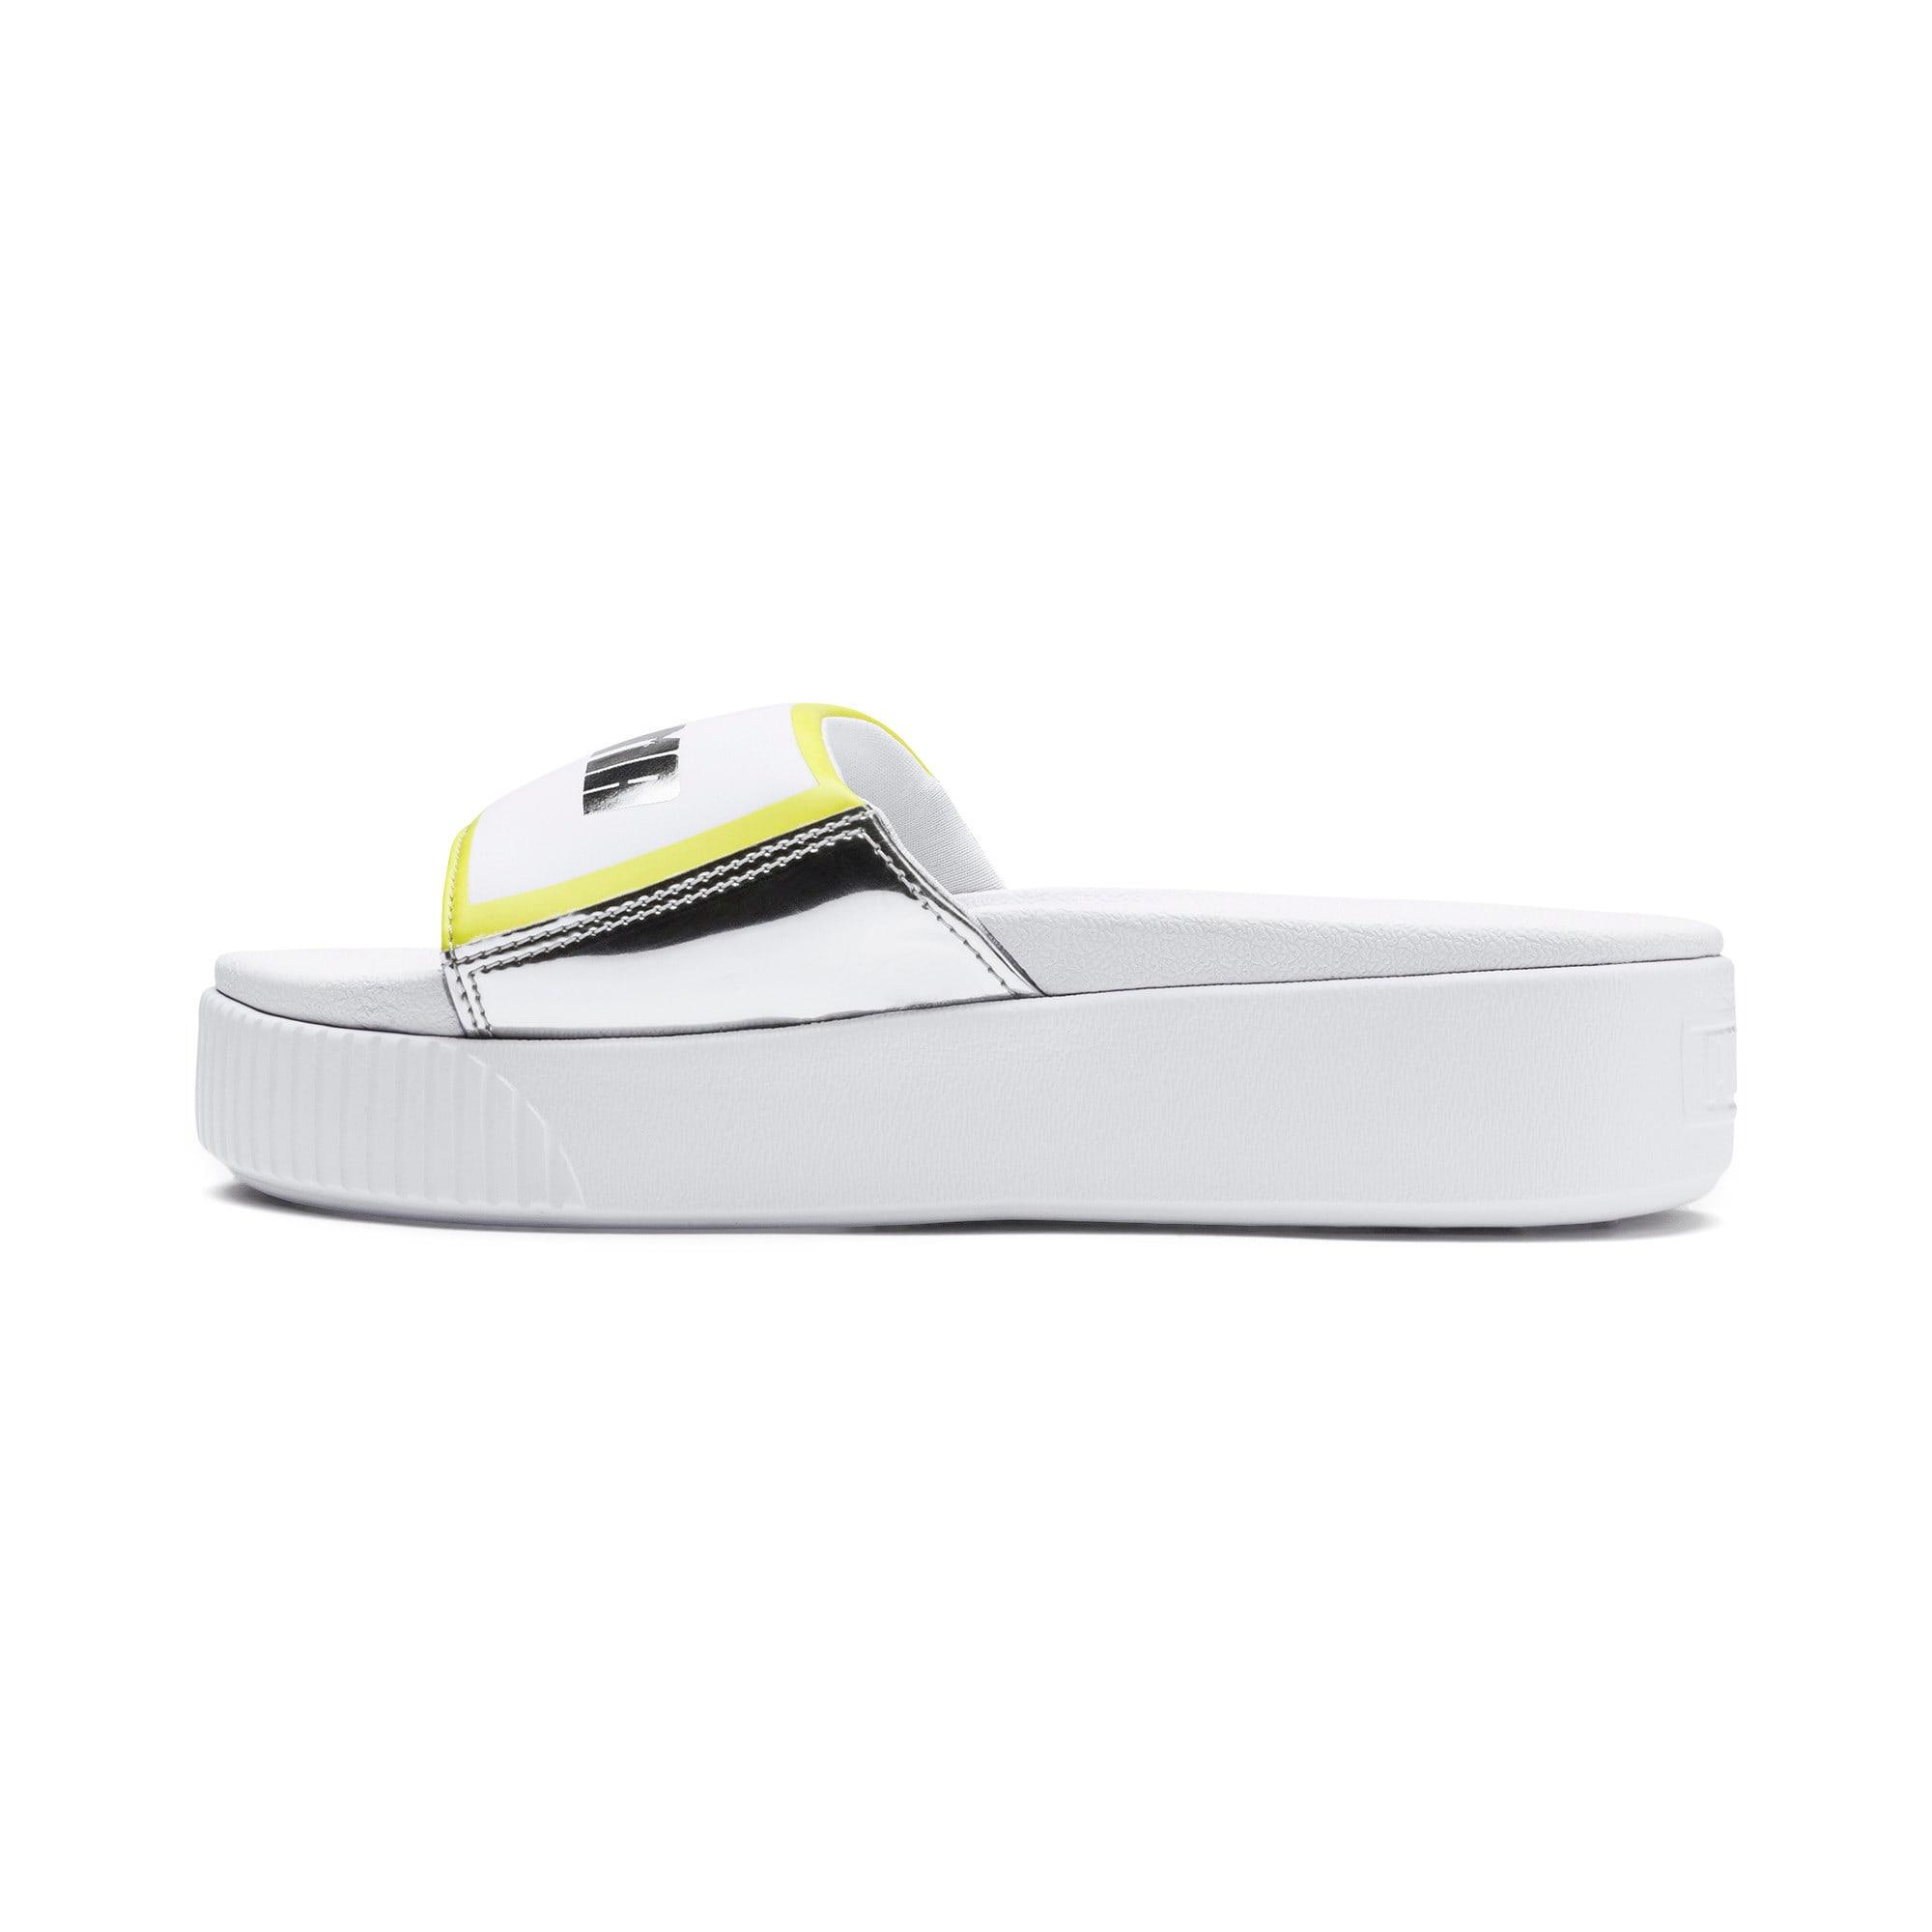 Thumbnail 1 of Platform Slide Trailblazer Metallic Women's Sandals, Puma White-Puma Silver, medium